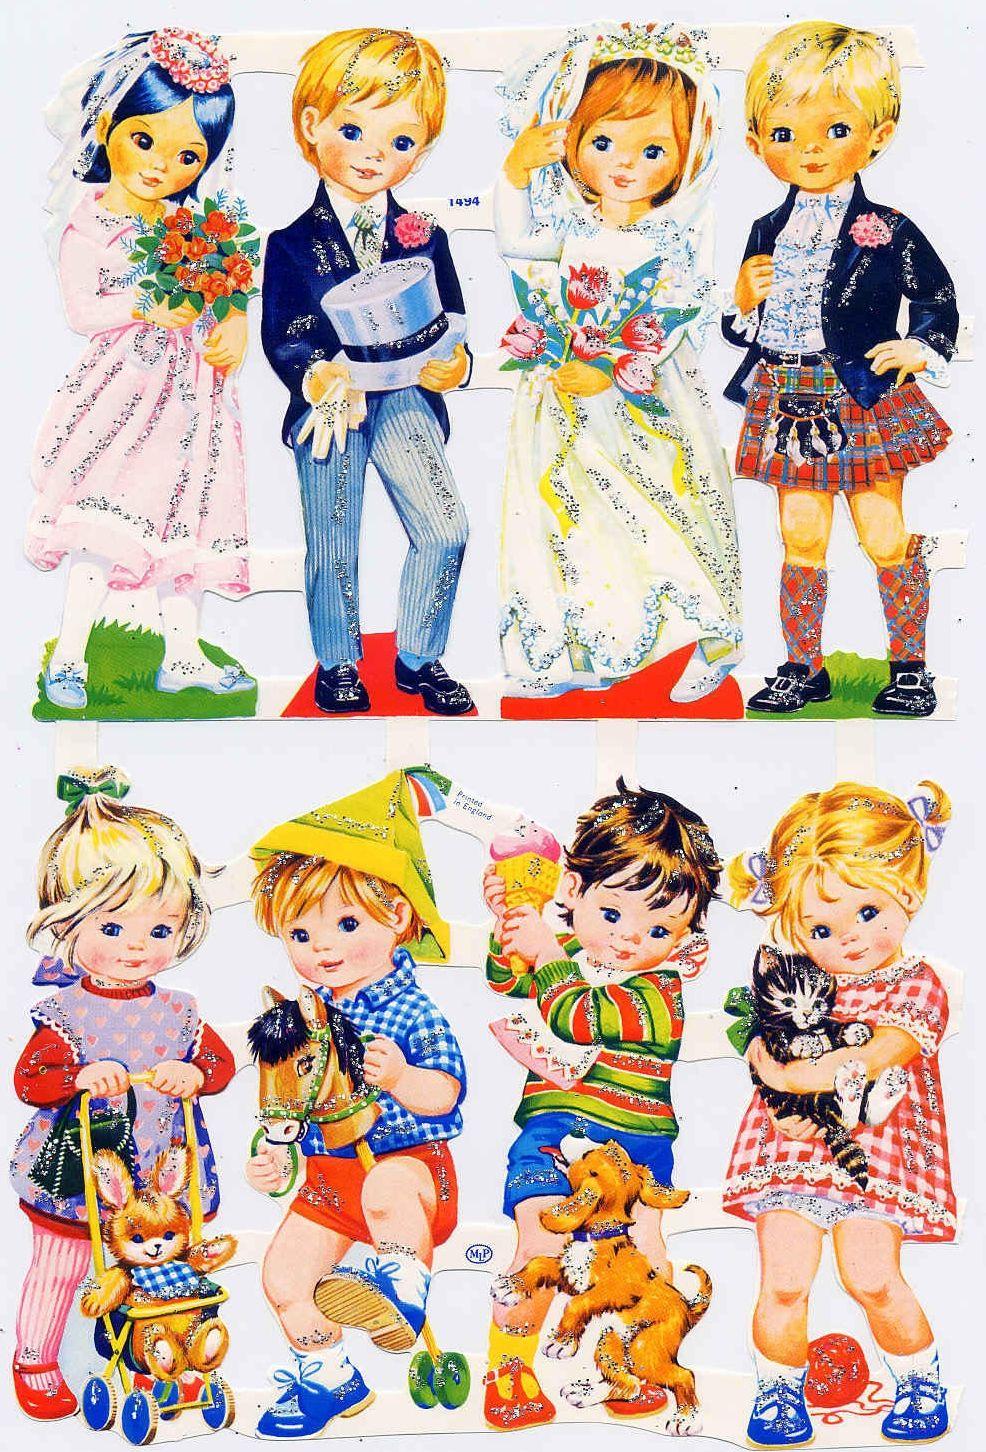 Collants Annees 70 Paper Dolls Stickers 70 S Vintage Baby Pictures Scrap Paper Childhood Memories